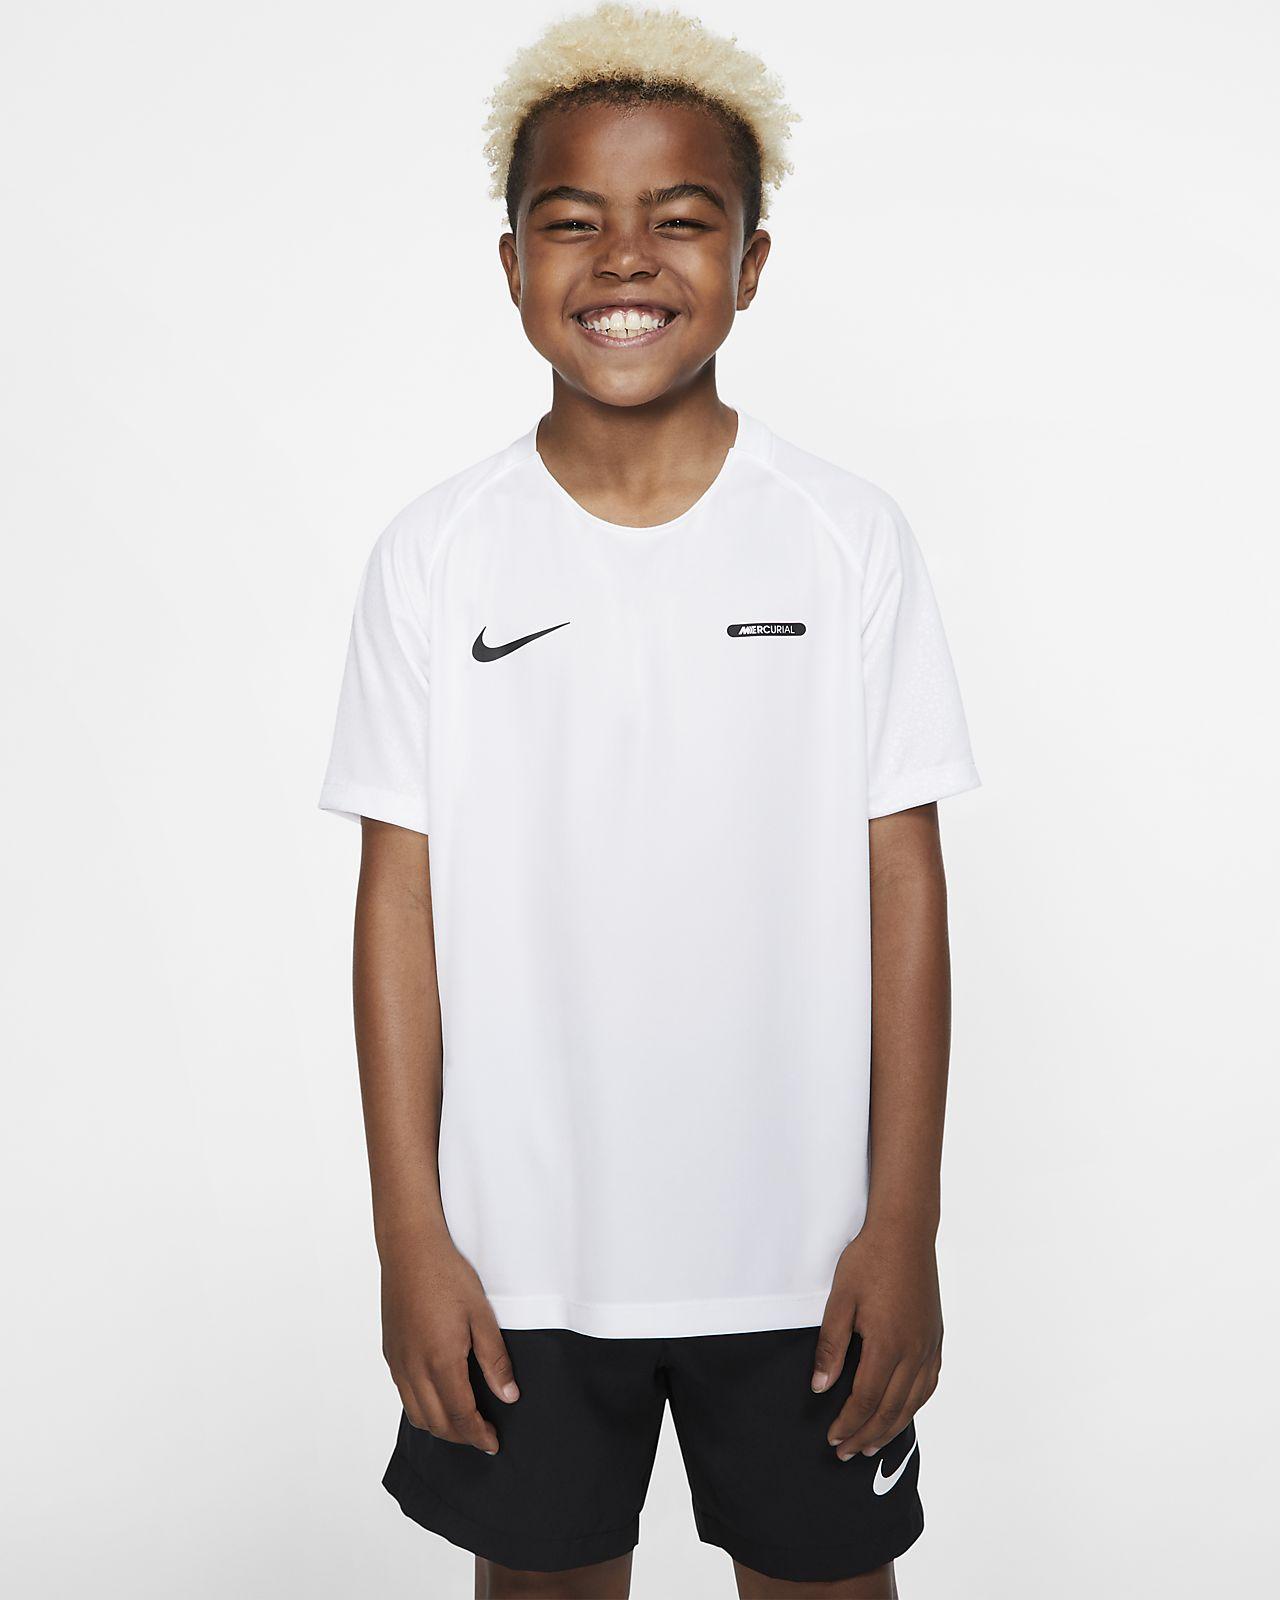 Nike Dri-FIT Mercurial Camiseta de fútbol de manga corta - Niño/a